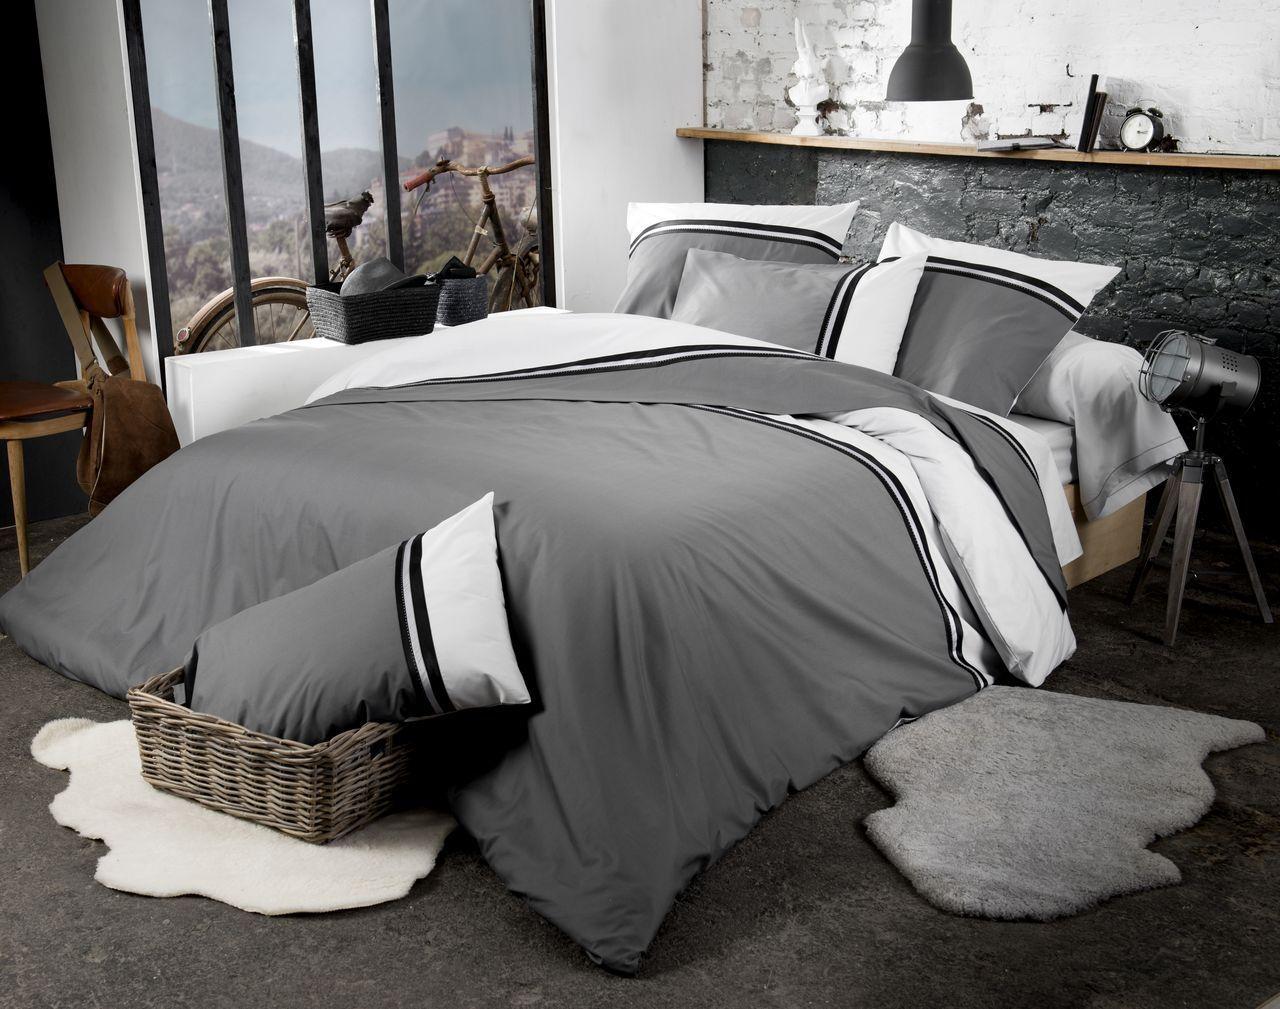 parure de lit smoking percale galon satin dp 240x310 2to tradilinge. Black Bedroom Furniture Sets. Home Design Ideas